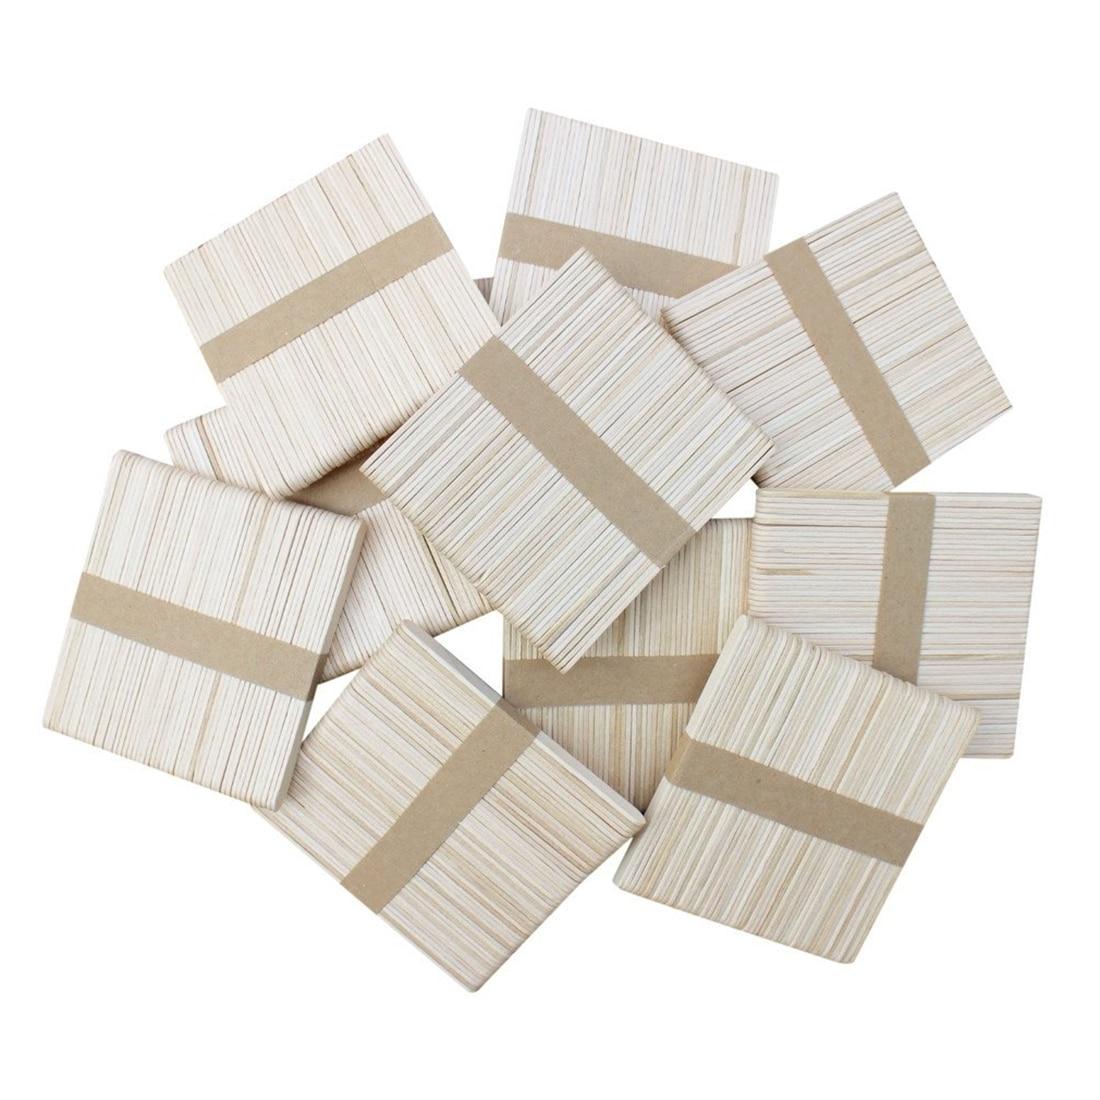 300 PCS Natural Wood Popsicle Sticks, Wooden Popsicle Stick, Homemade Ice Cream Sticks, Natural Wood Craft Sticks, Great For C